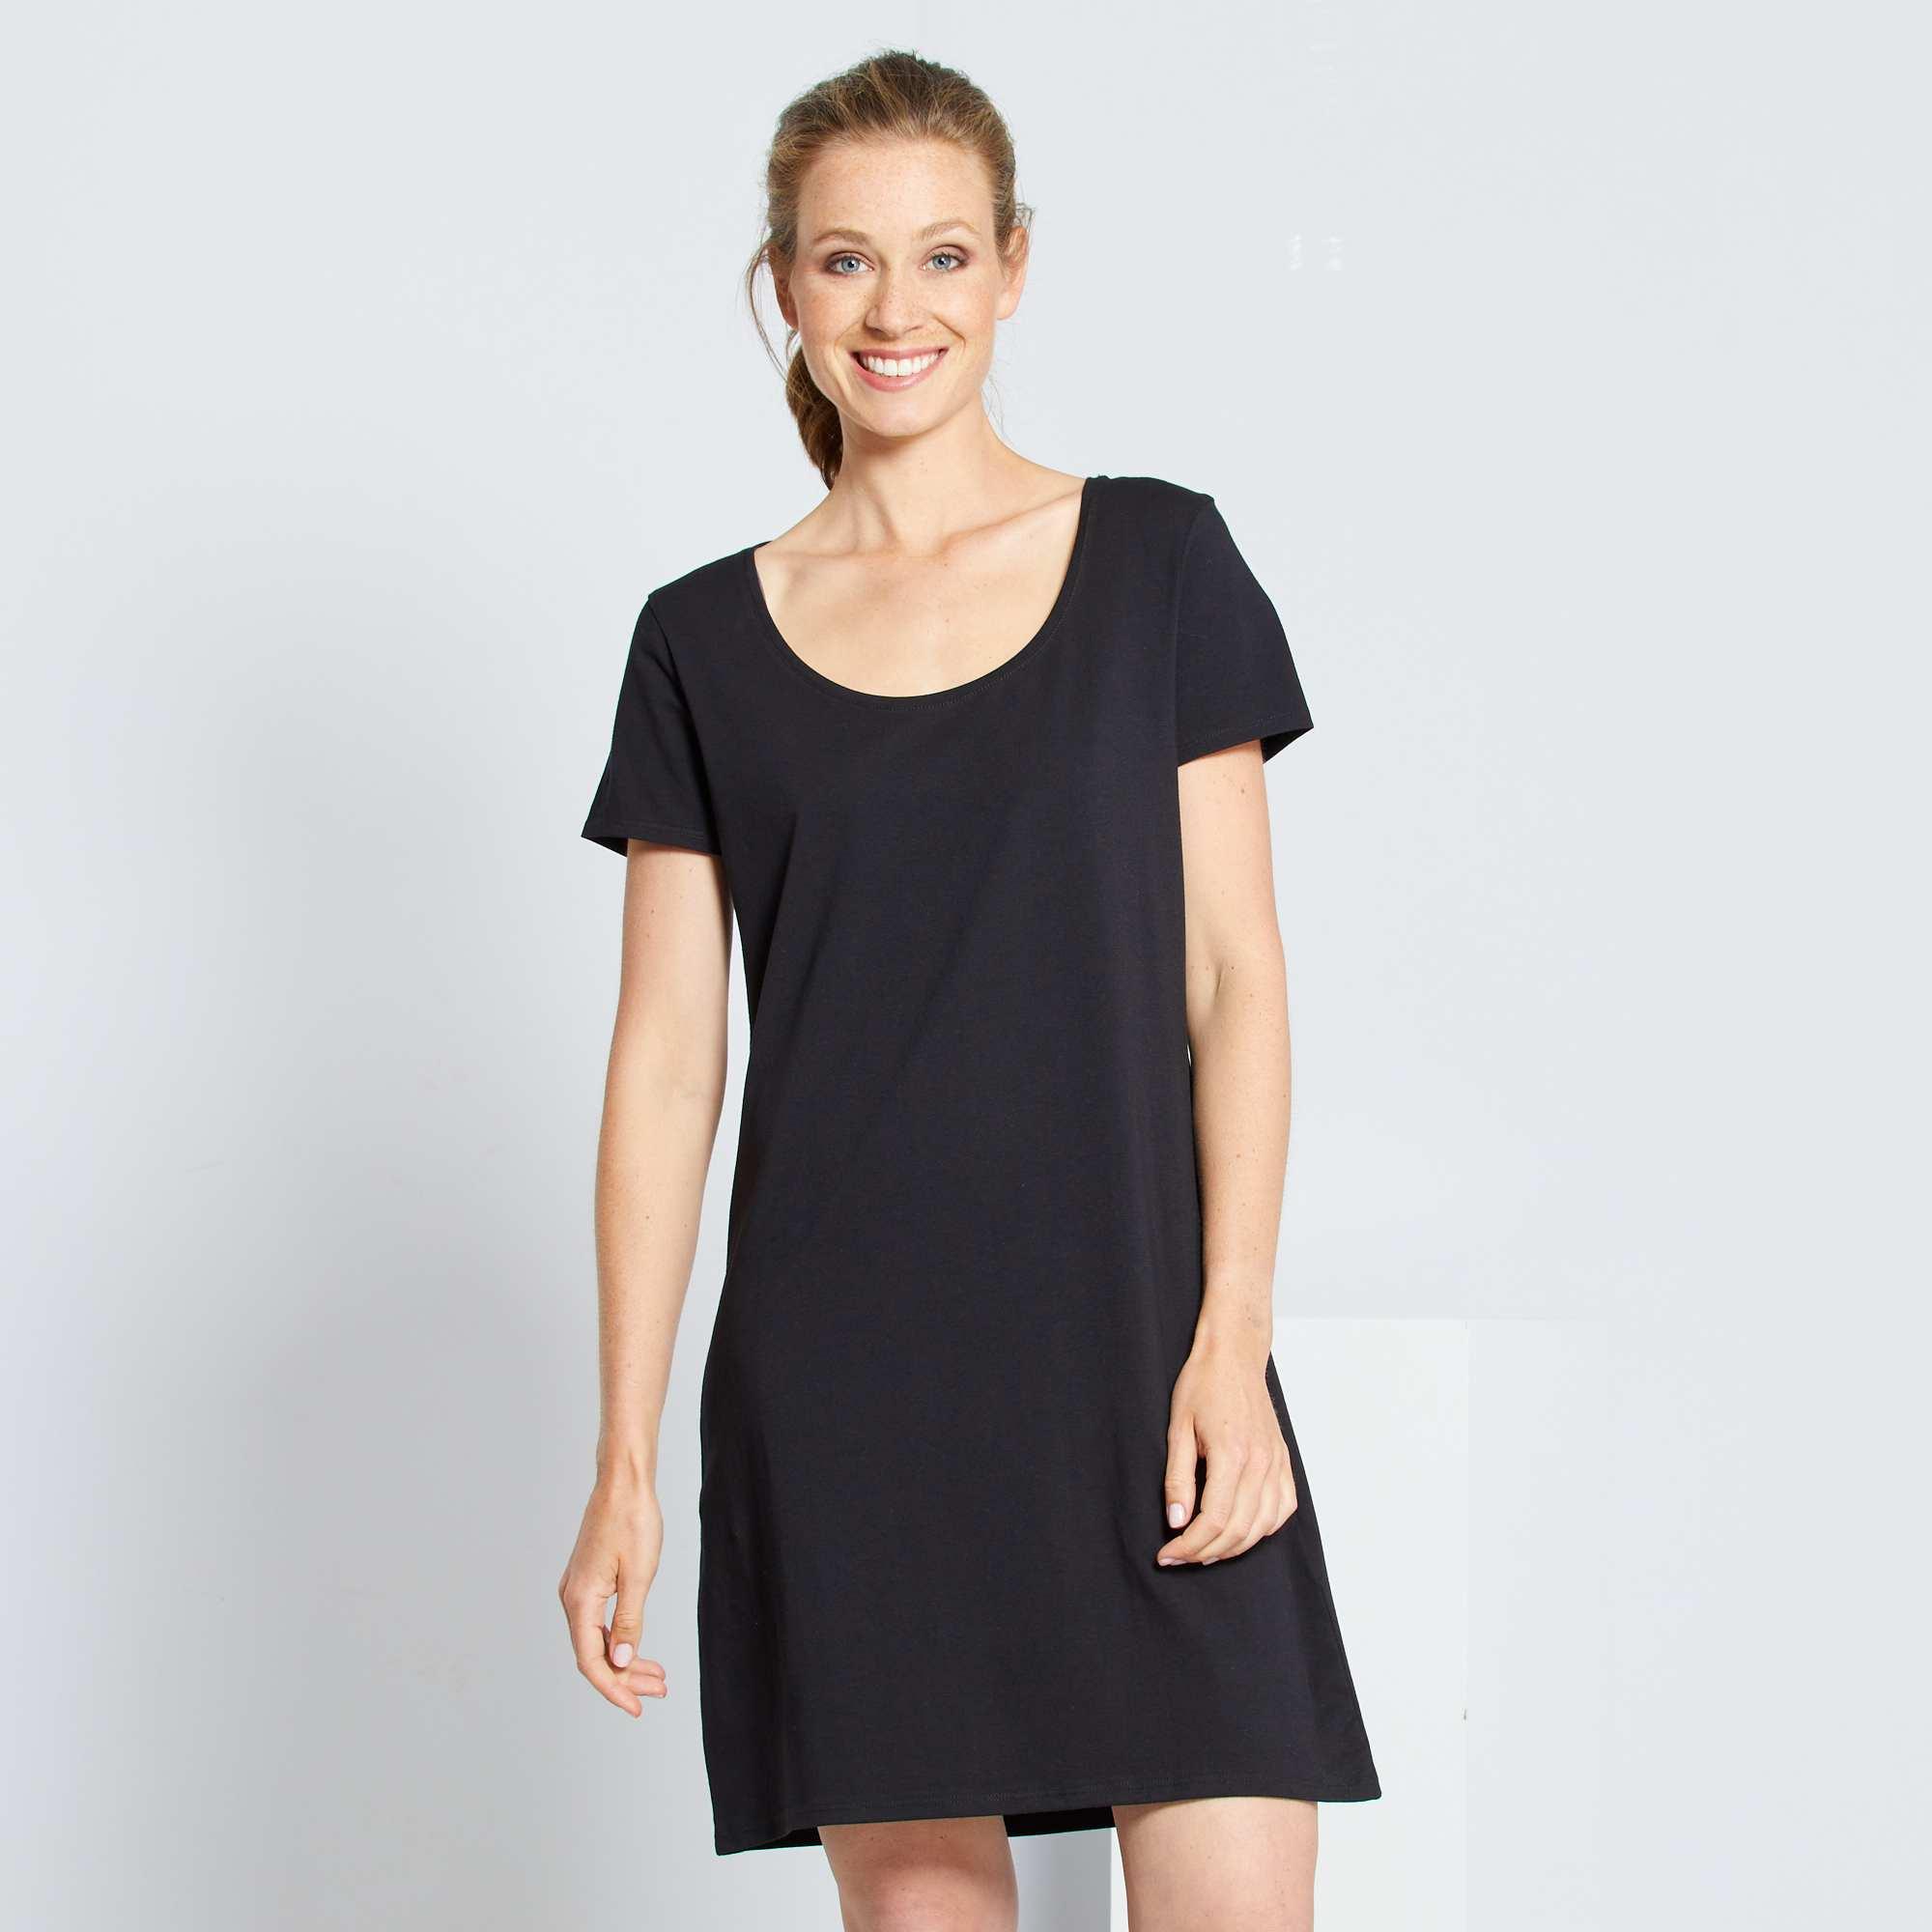 Vestido tipo camiseta Mujer talla 34 to 48 - negro - Kiabi - 8,00€